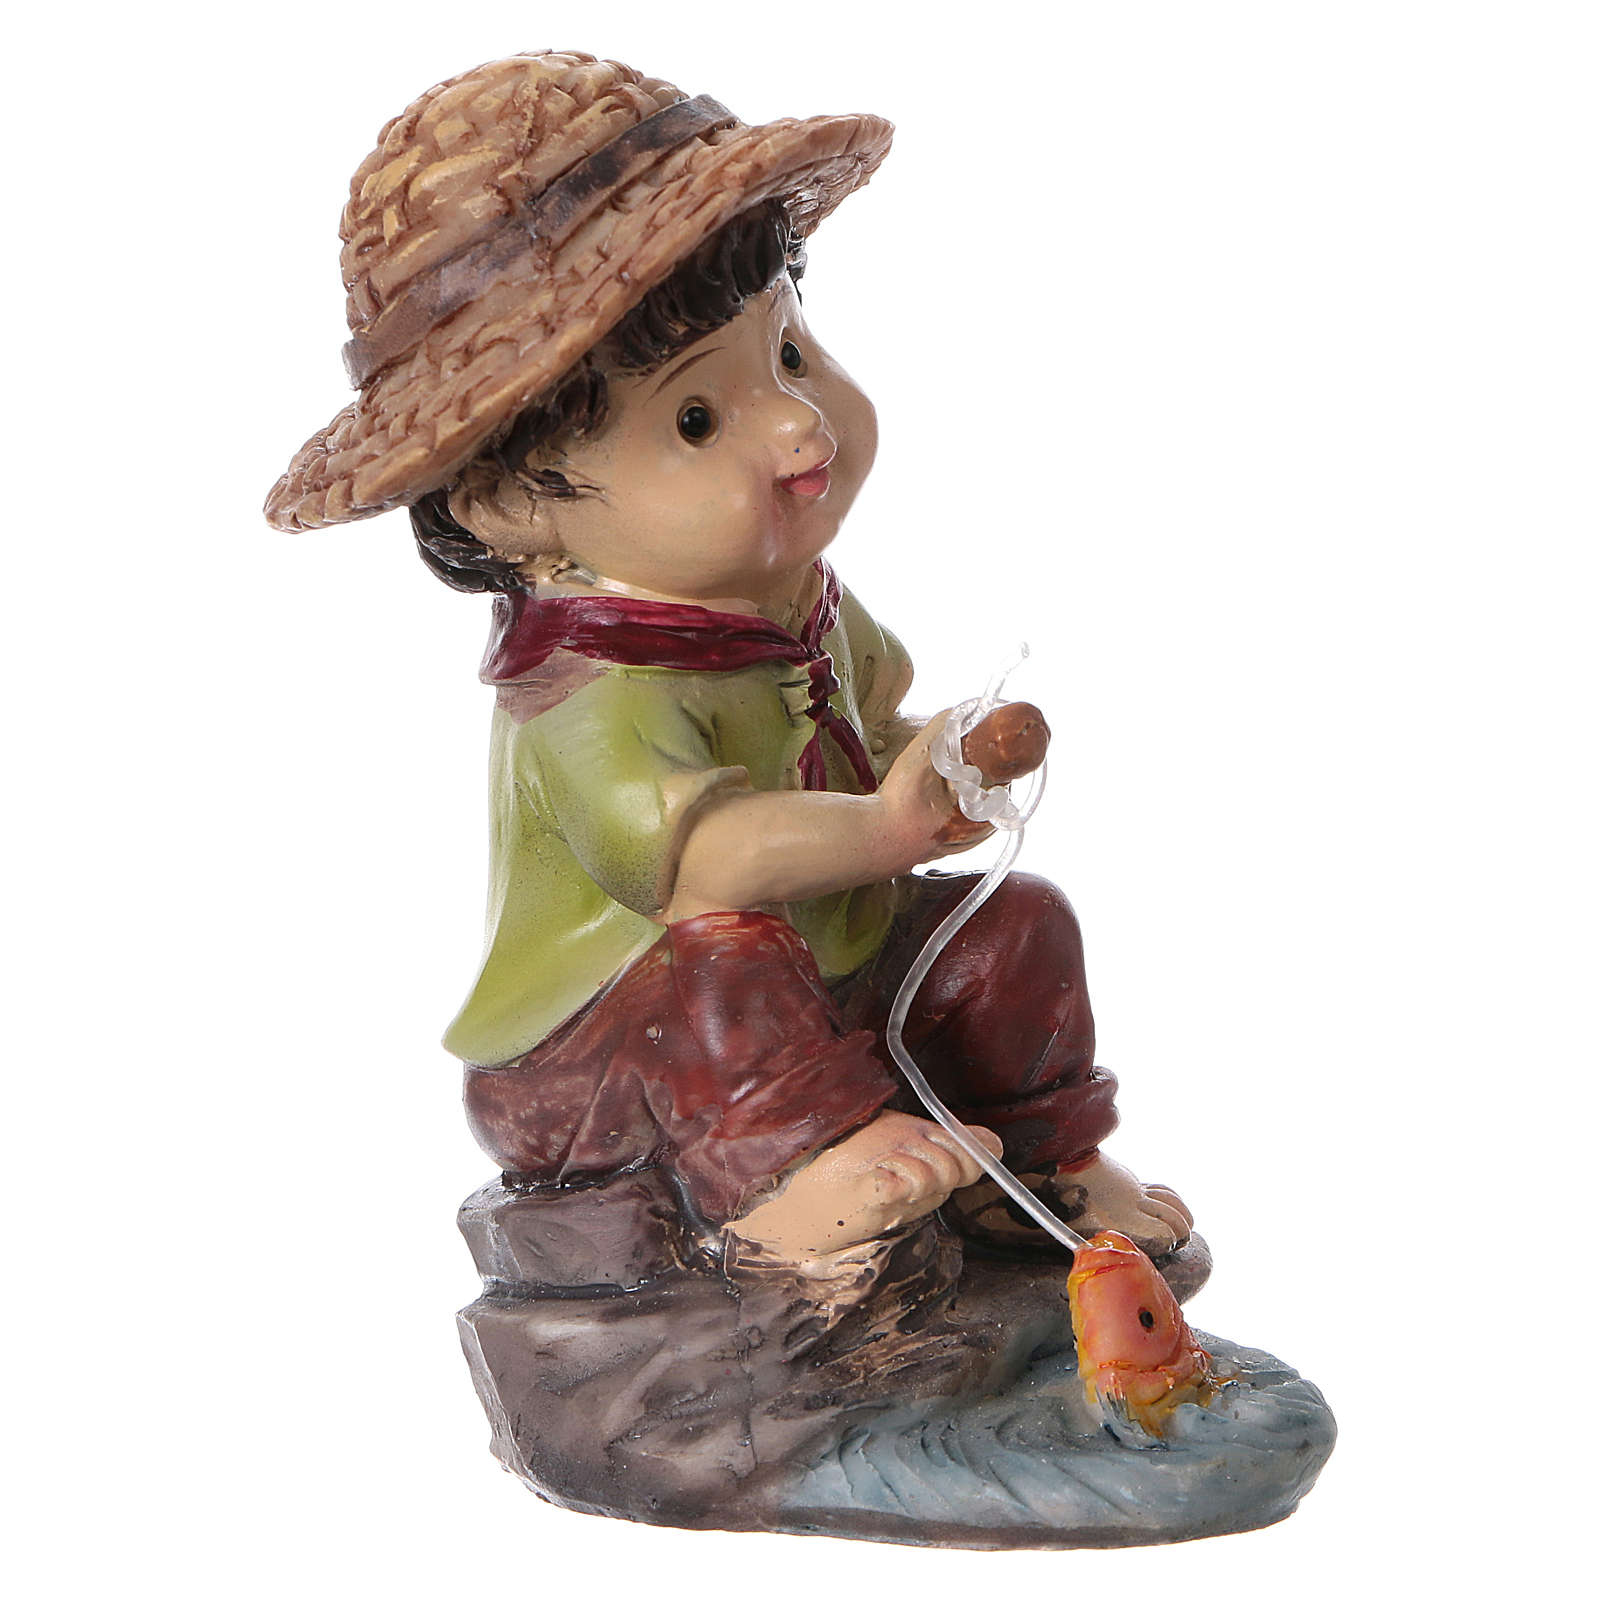 Fisherman figurine for Nativity scenes of 9 cm, children's line 3